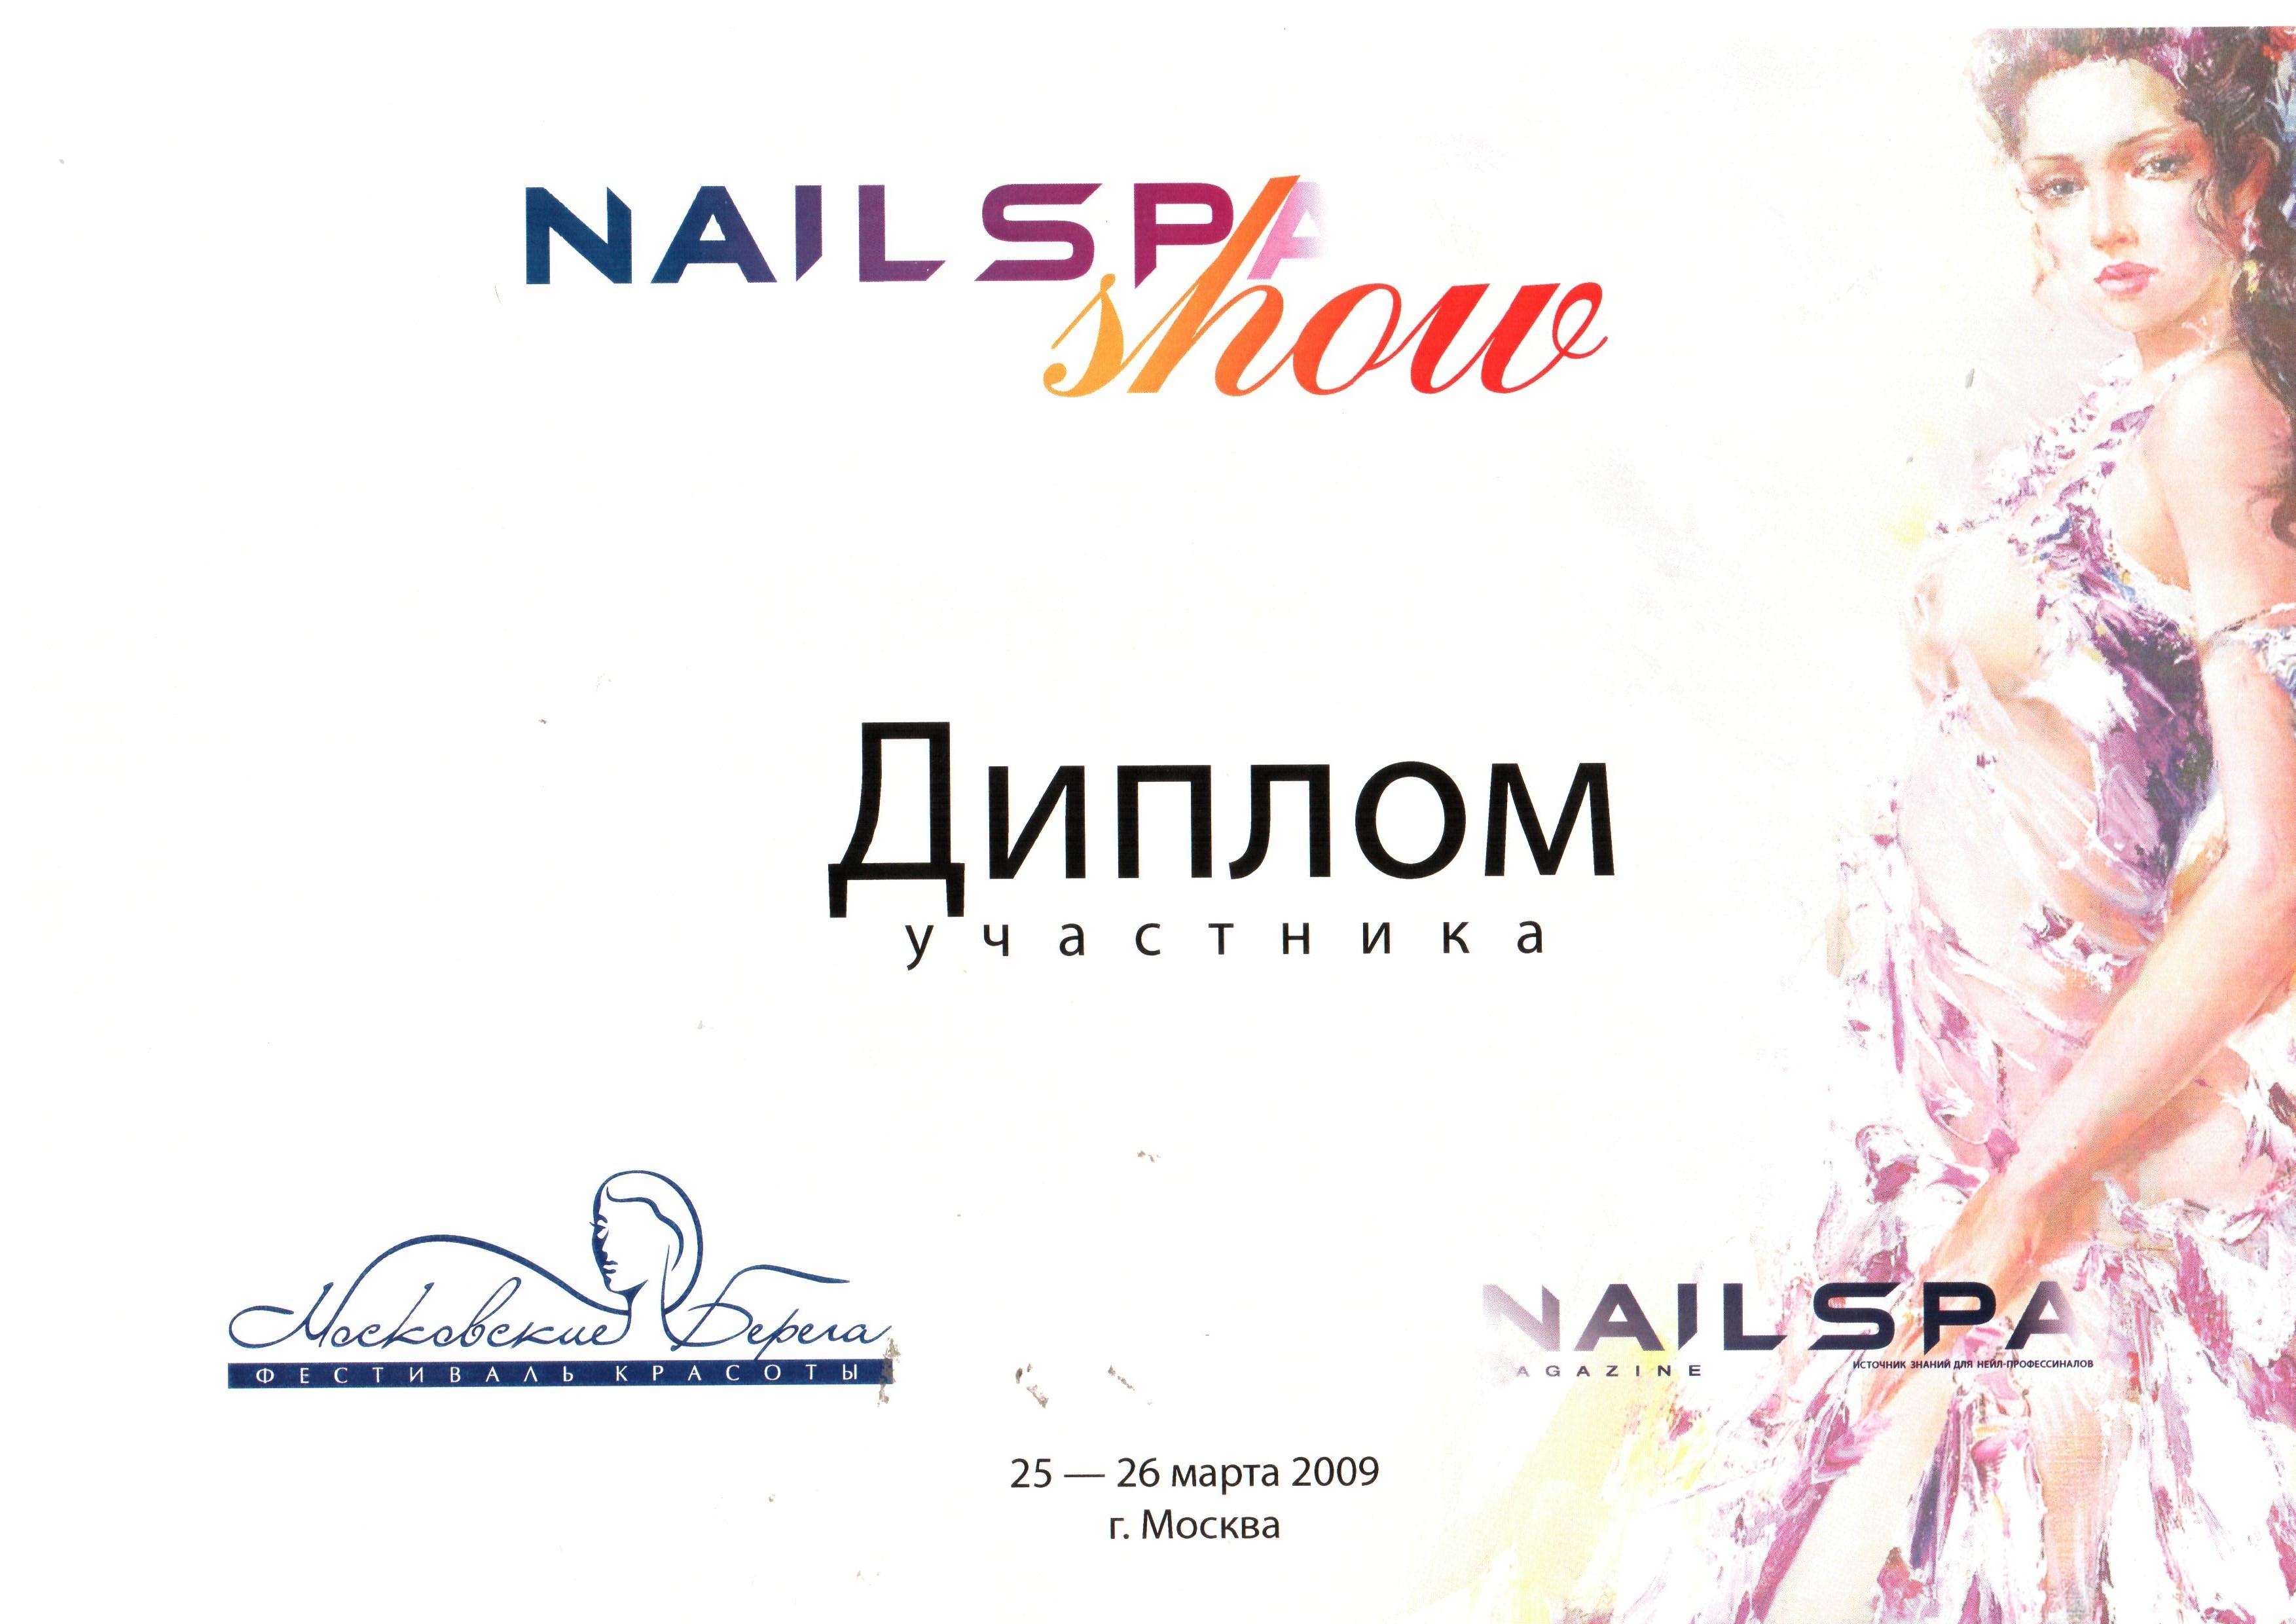 2009 nailspa